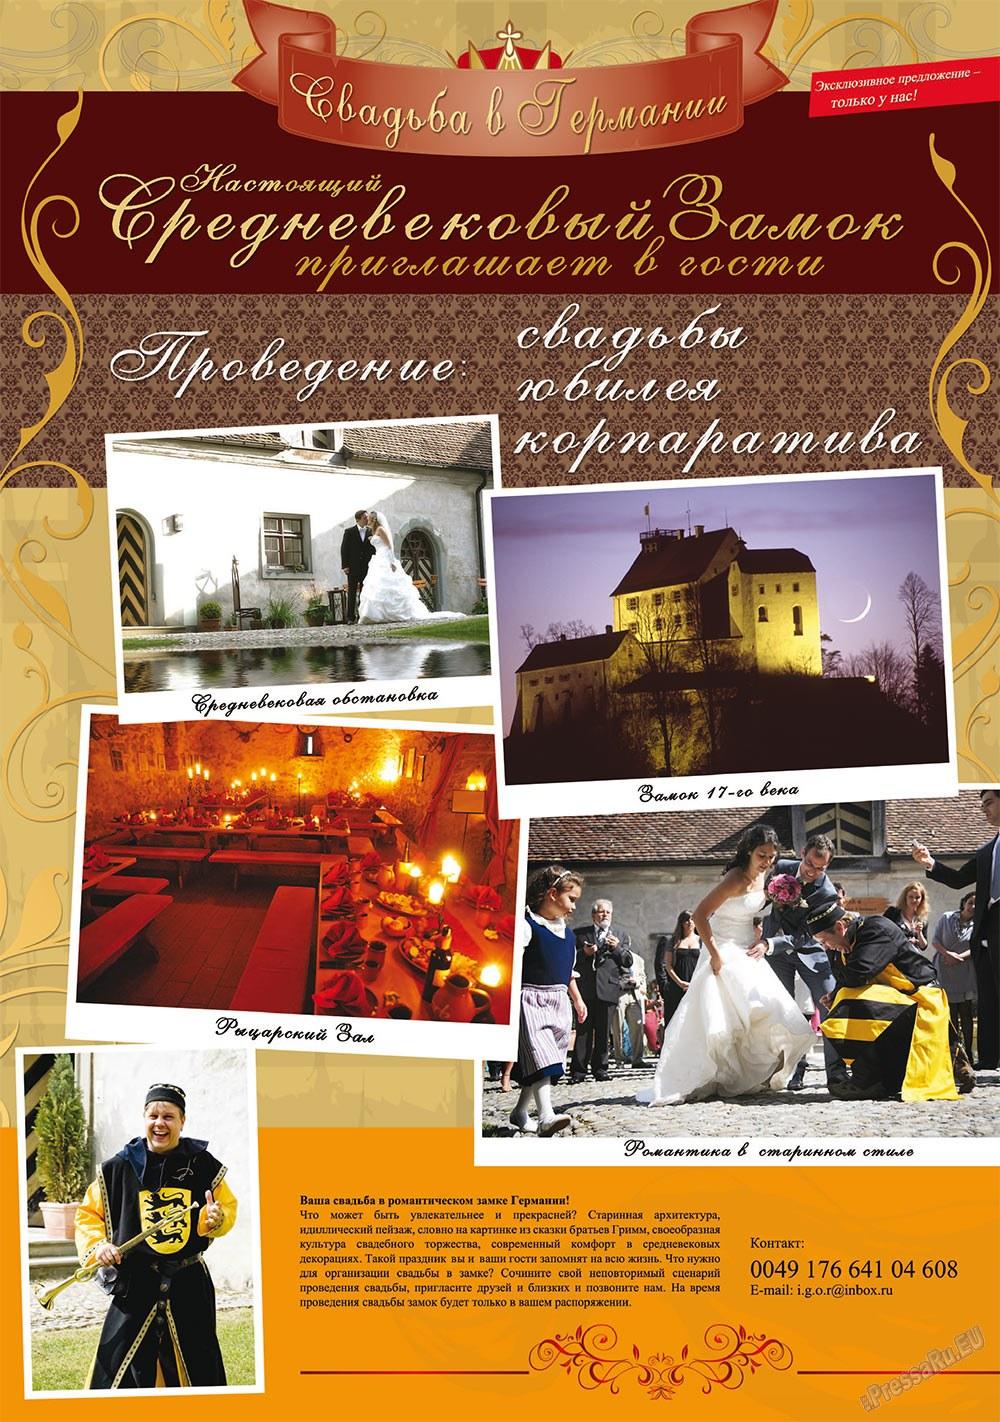 Бизнес парк (журнал). 2011 год, номер 5, стр. 23